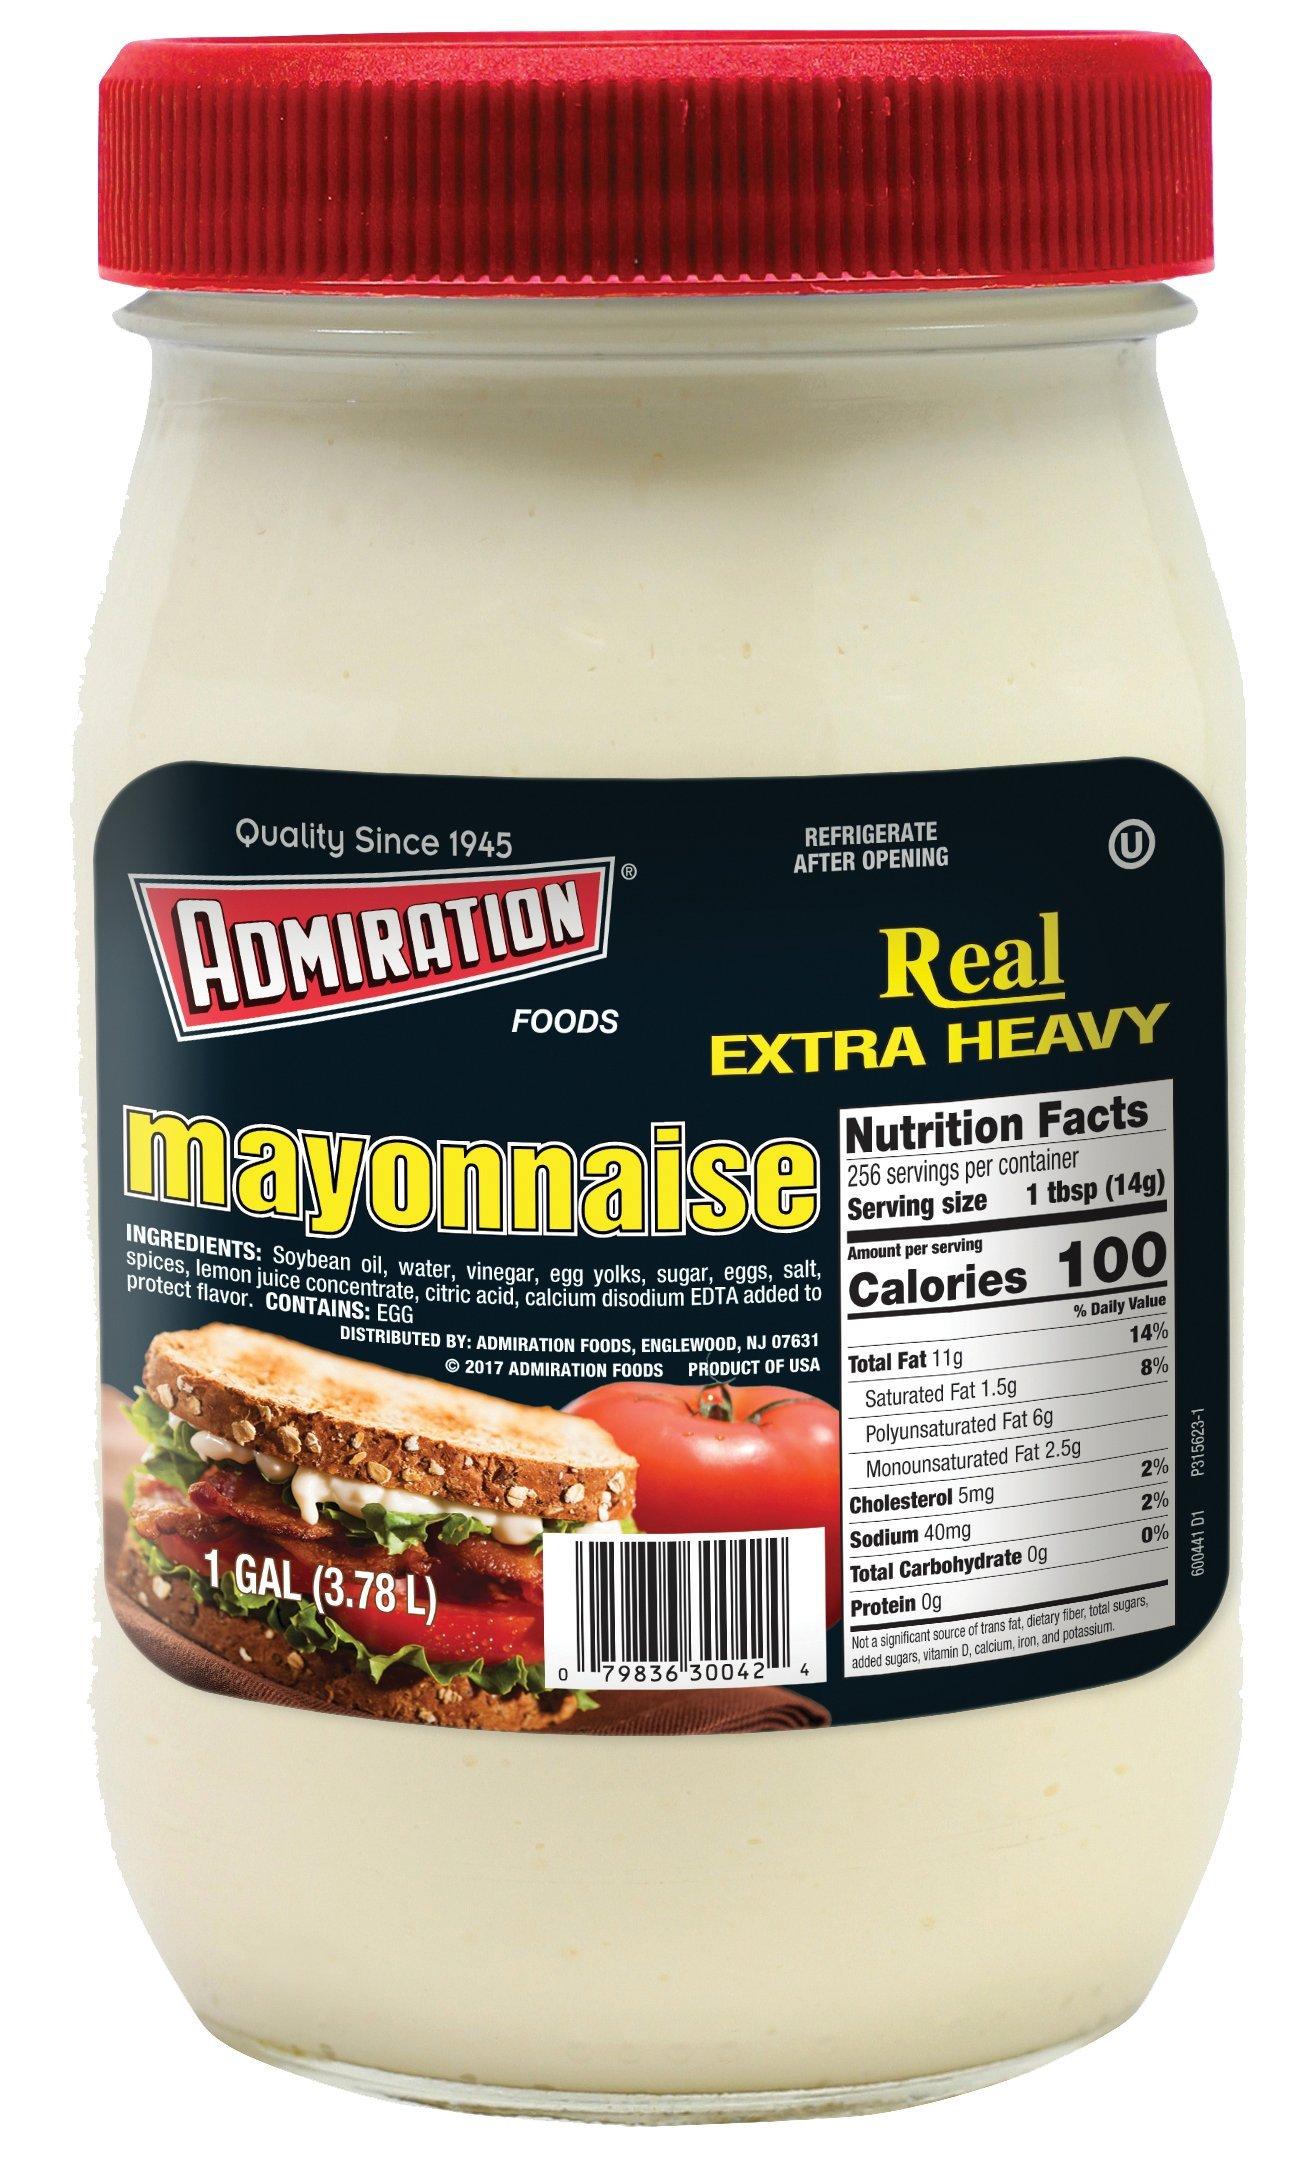 Admiration Extra Heavy Mayonnaise 128oz - Gallon